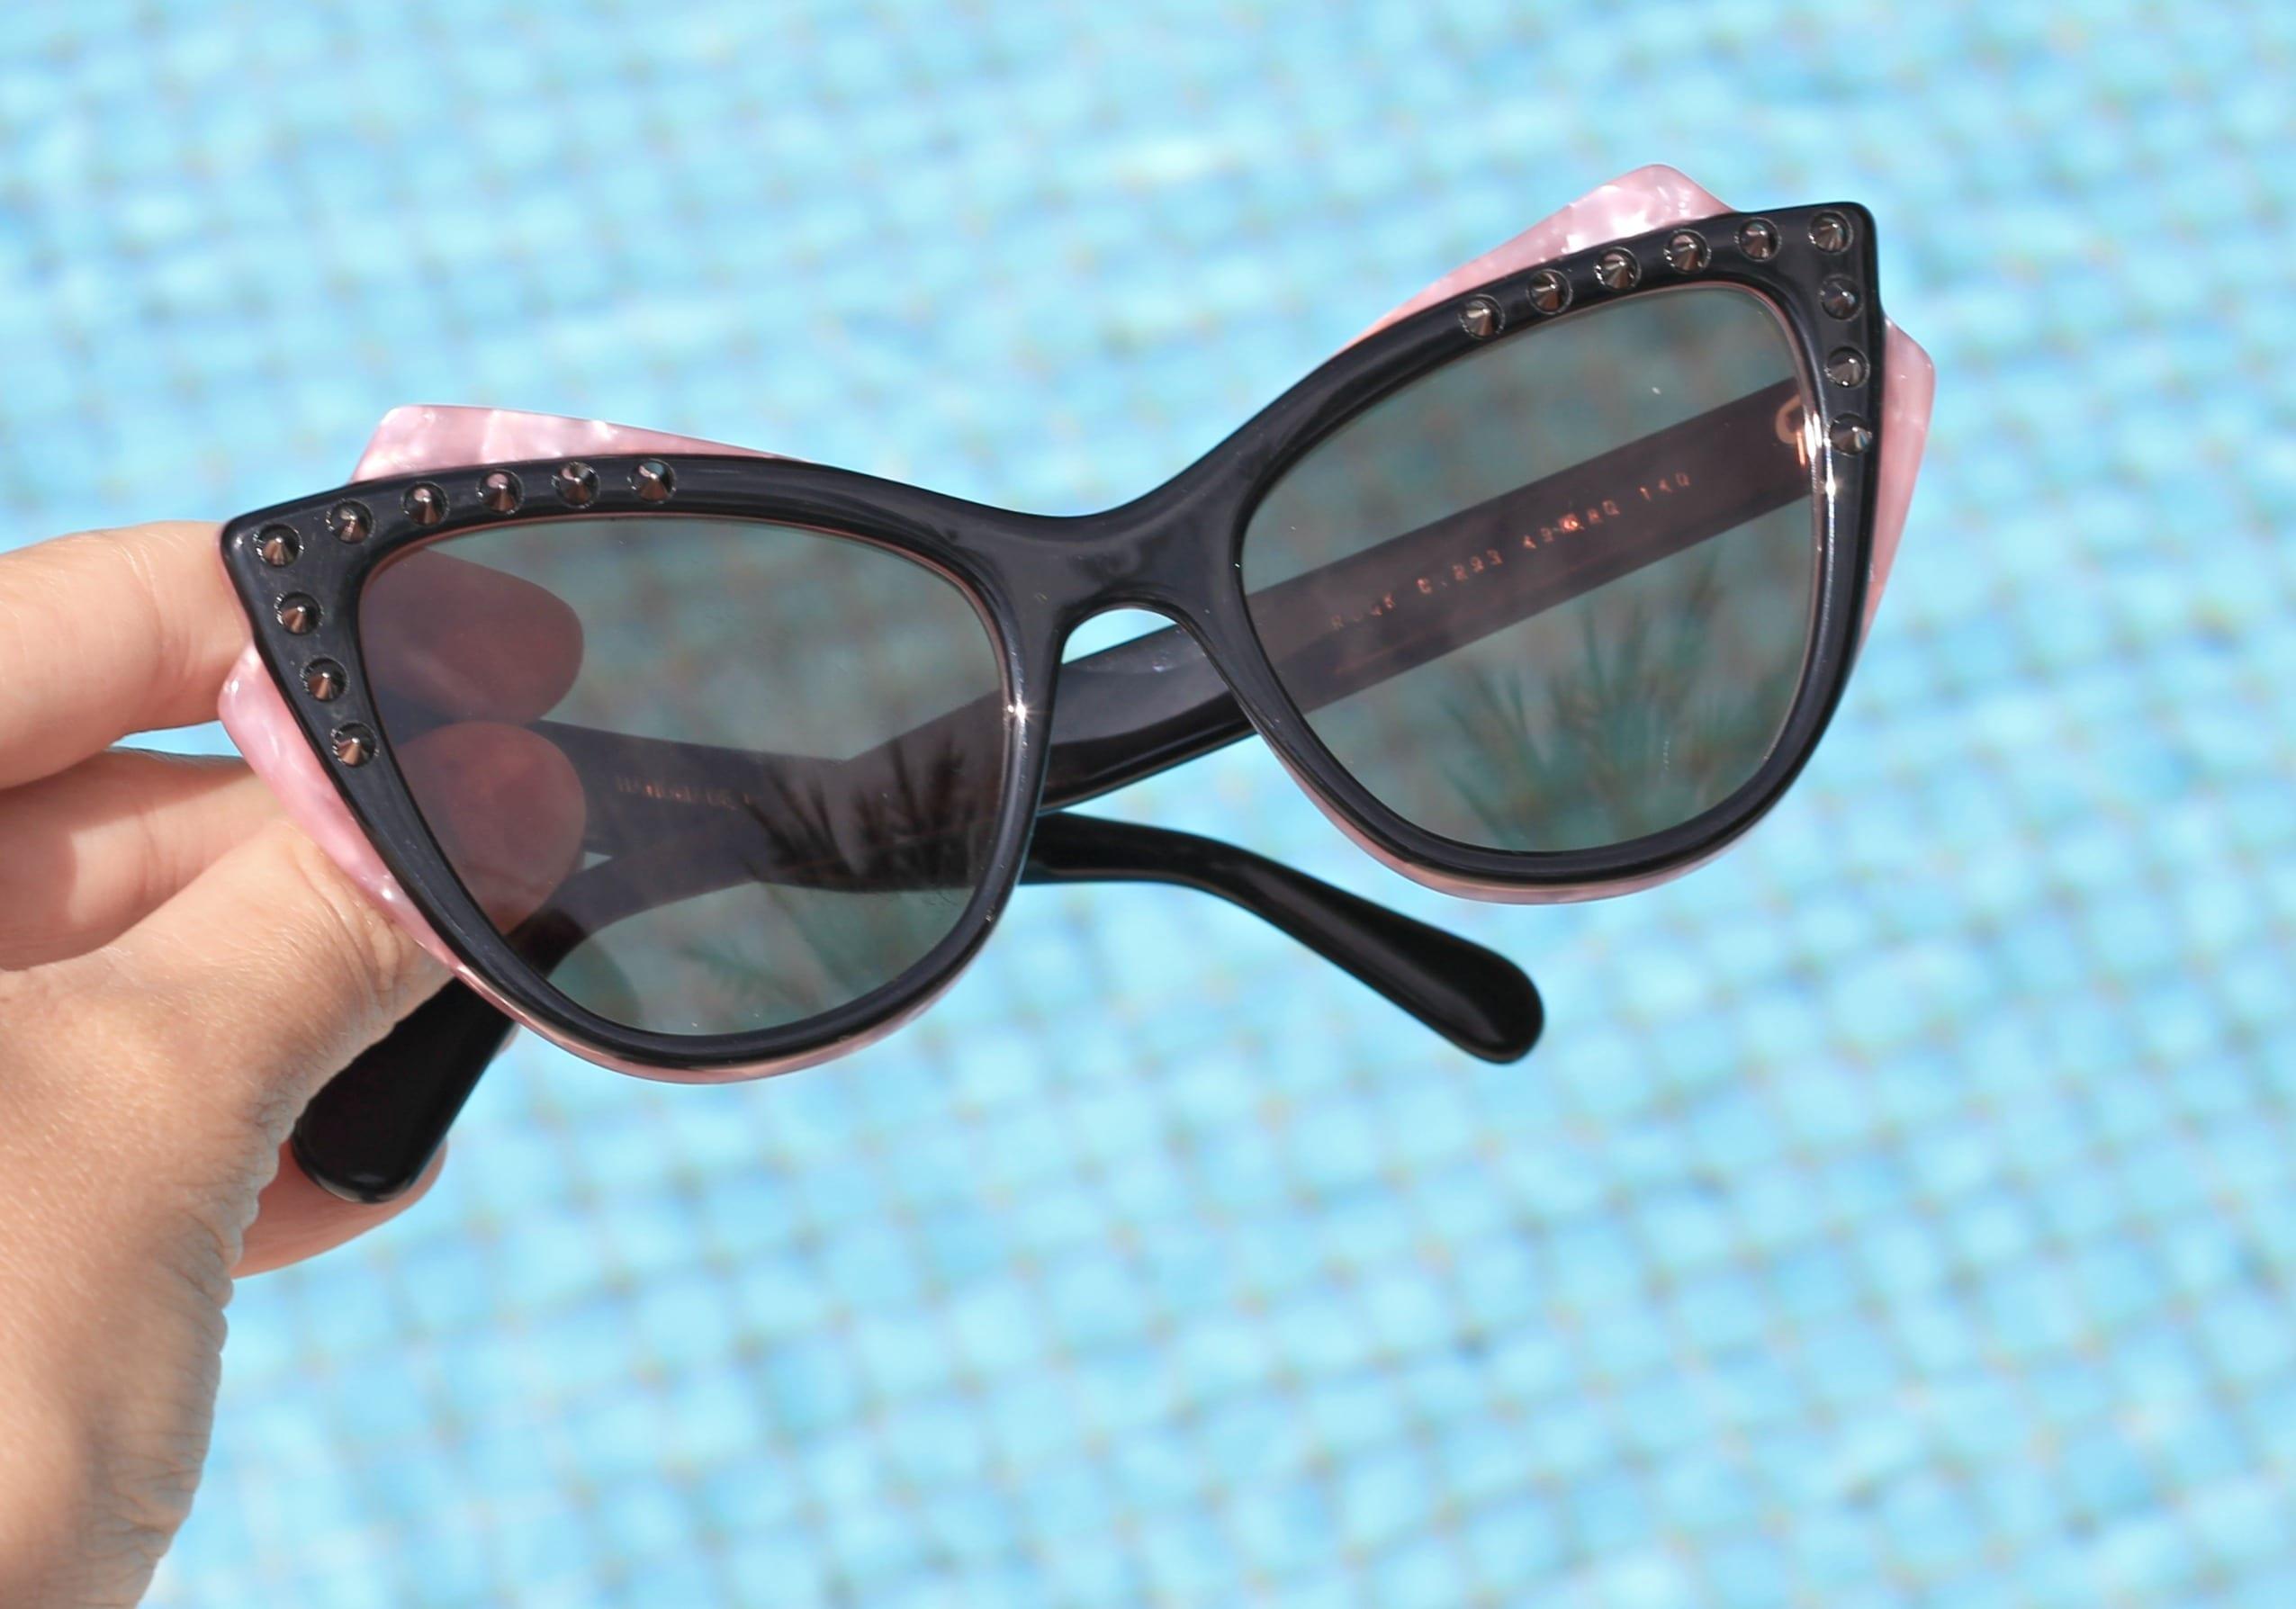 sunglasses 2016, occhiali da sole estate 2016, essedue sunglasses 2016, occhiale da sole donna essedue, occhiale da sole essedue, theladycracy.it, elisa bellino, fashion blog italia 2016, fashion blogger italiane, fashion blogger famose, fashion blog, fashion influencer 2016, top blogger 2016, fashion bloggers milano 2016, best fashion blogger 2016, off shoulder top 2016, elisa bellino